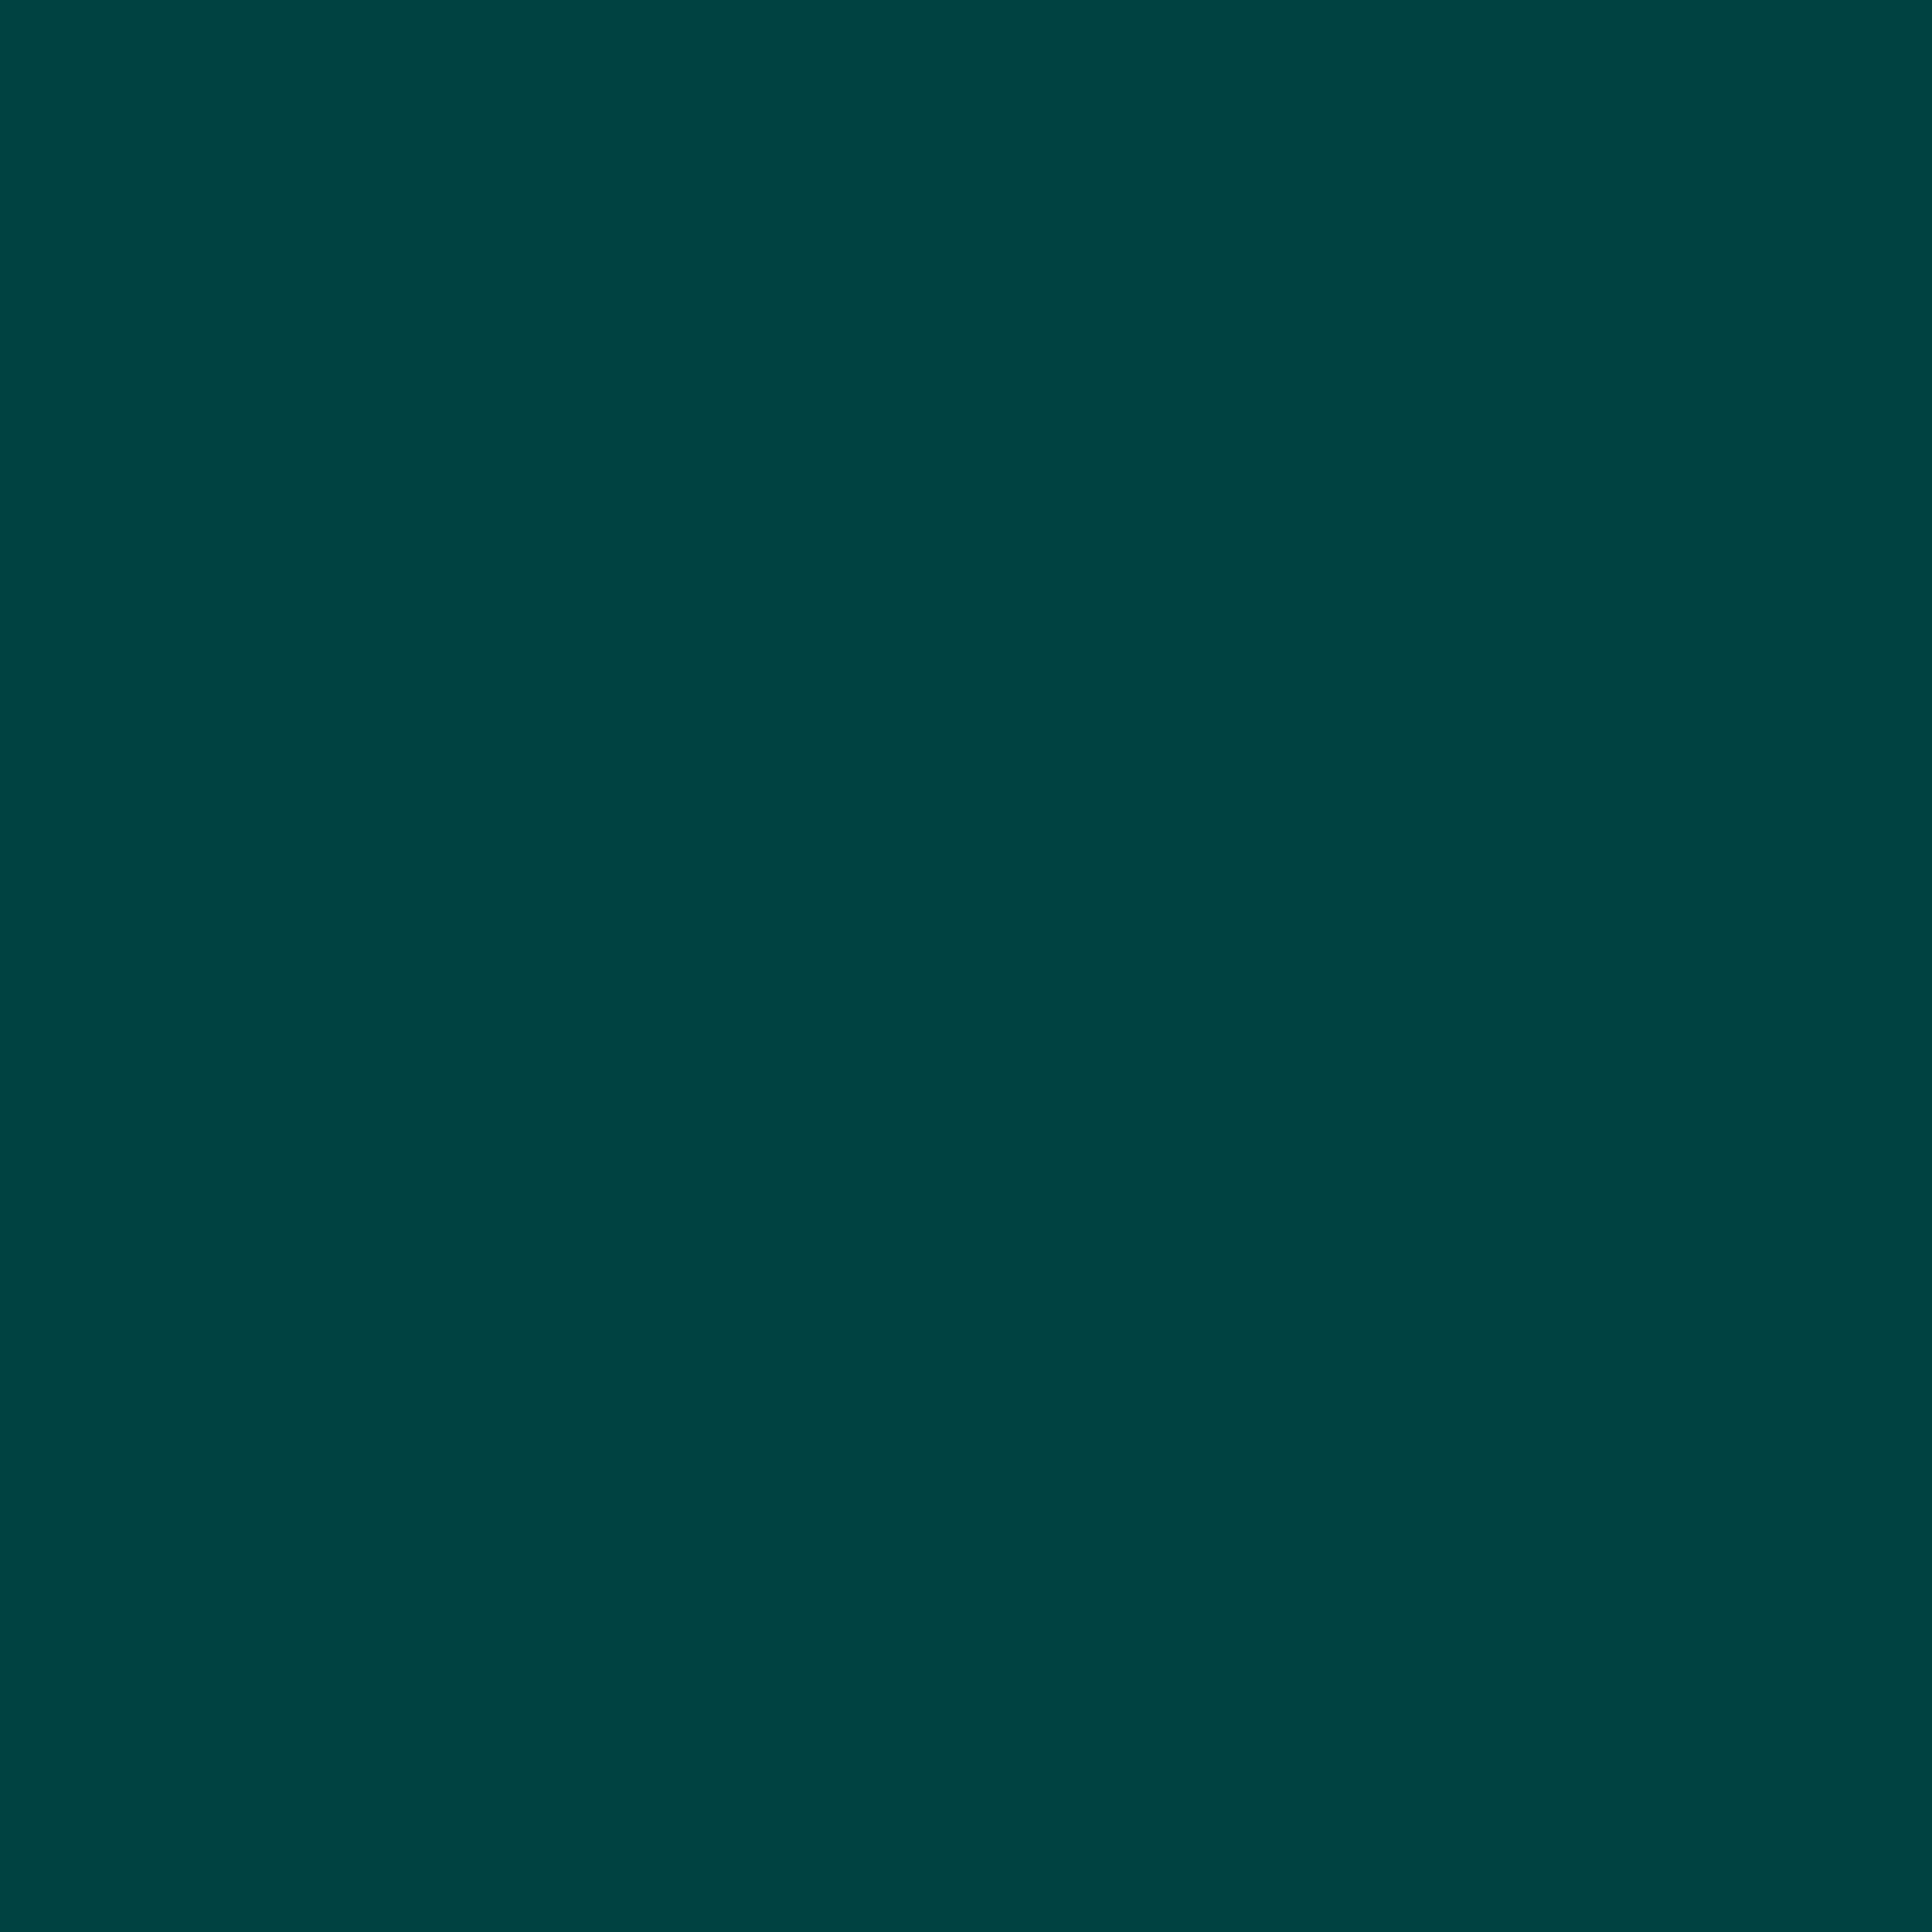 2732x2732 Warm Black Solid Color Background